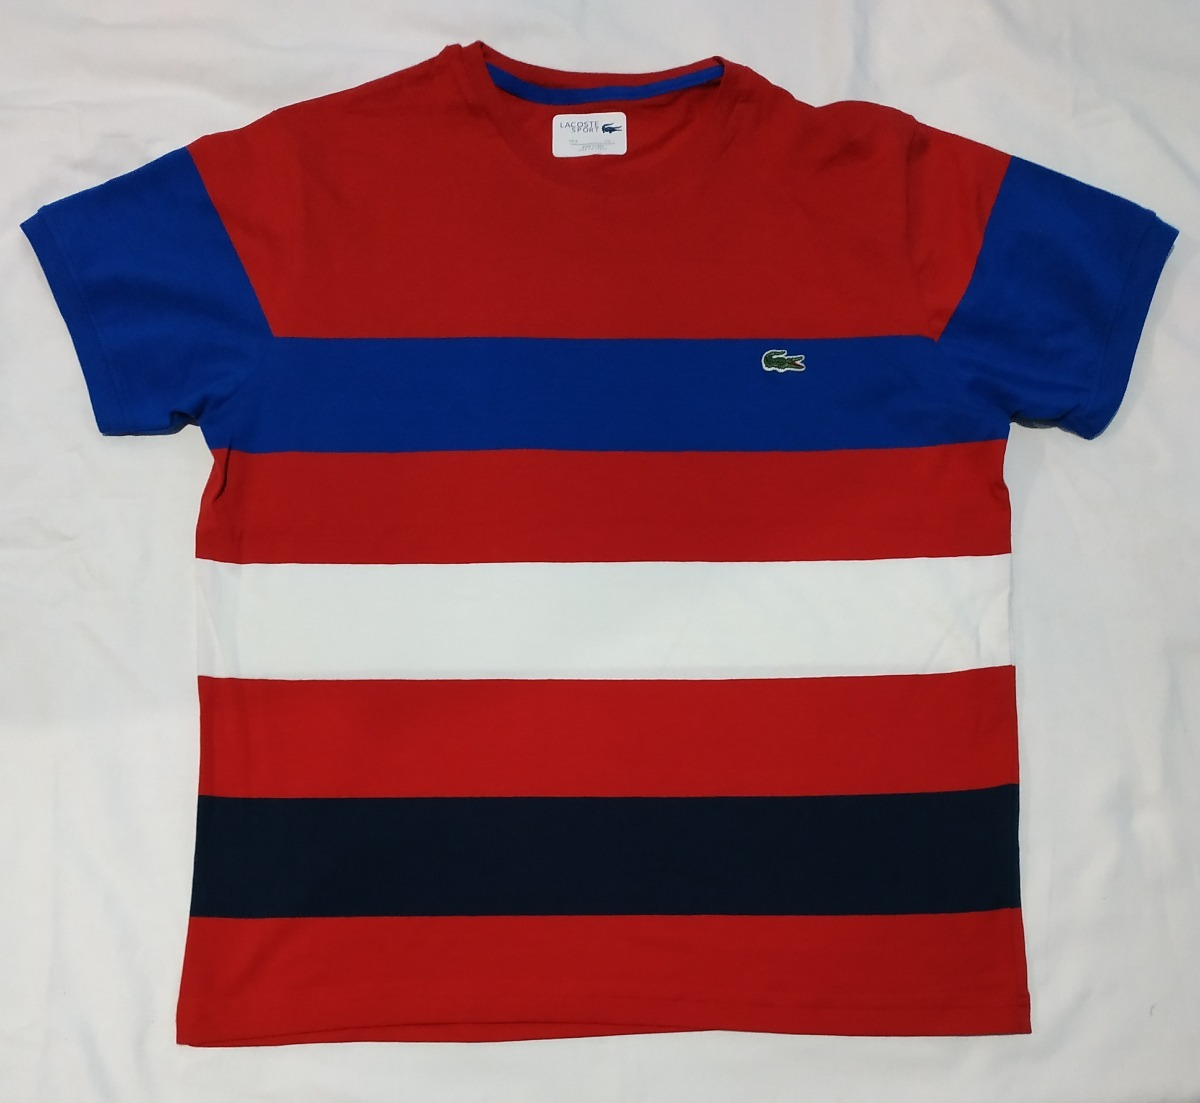 d01d03eb672 Novas Camisa Lacoste França